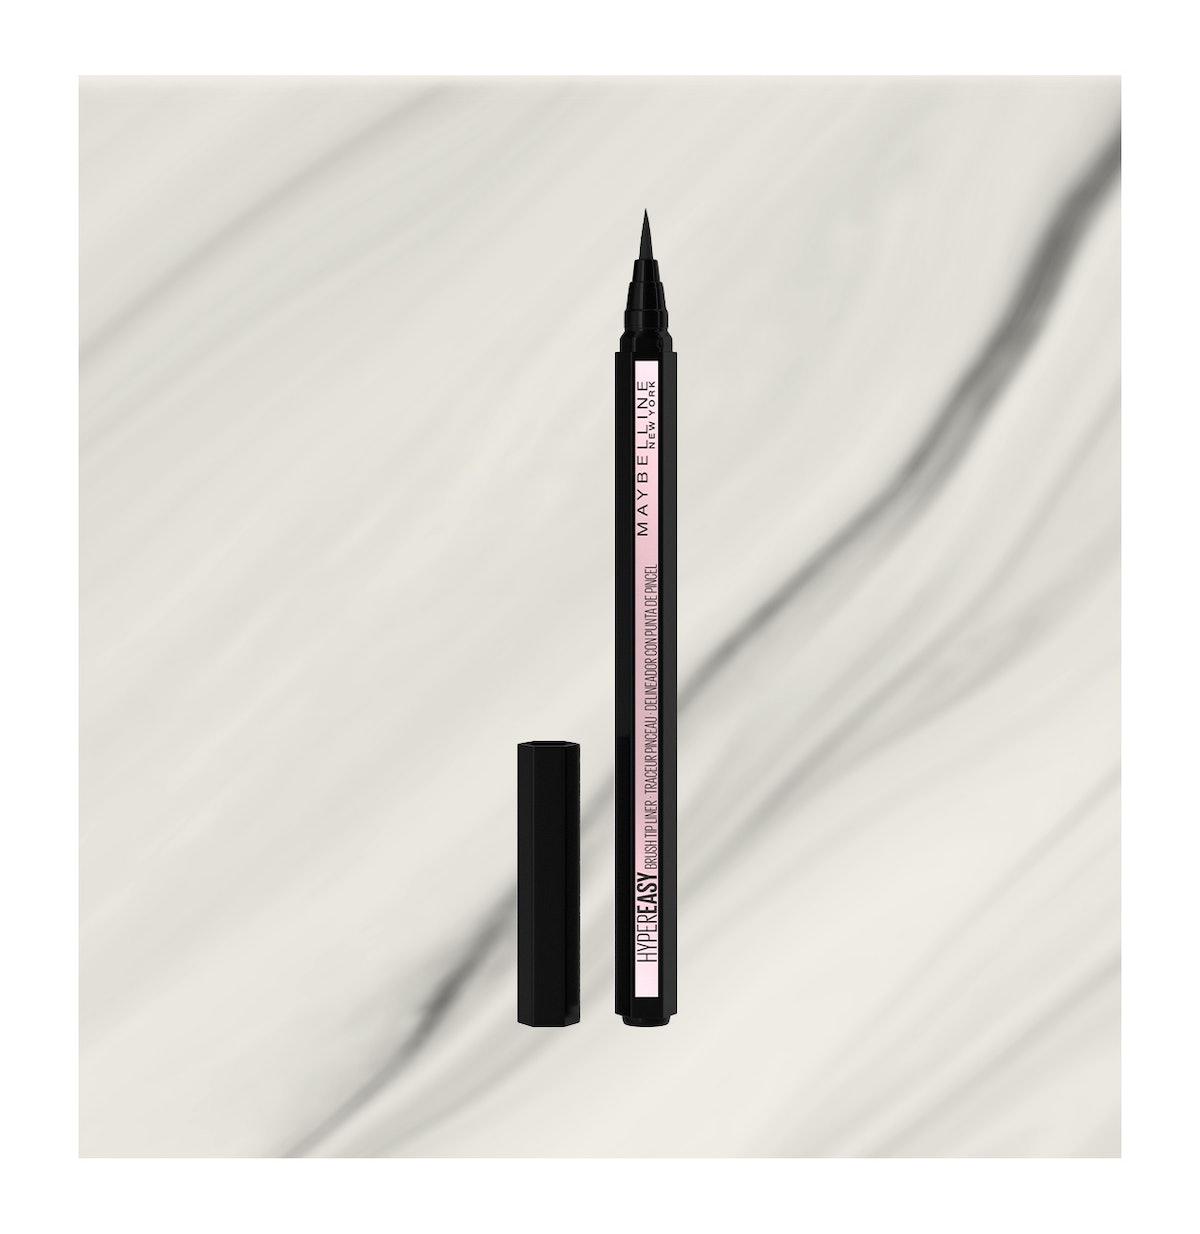 Eyestudio Hyper Easy Liquid Eyeliner in Pitch Black